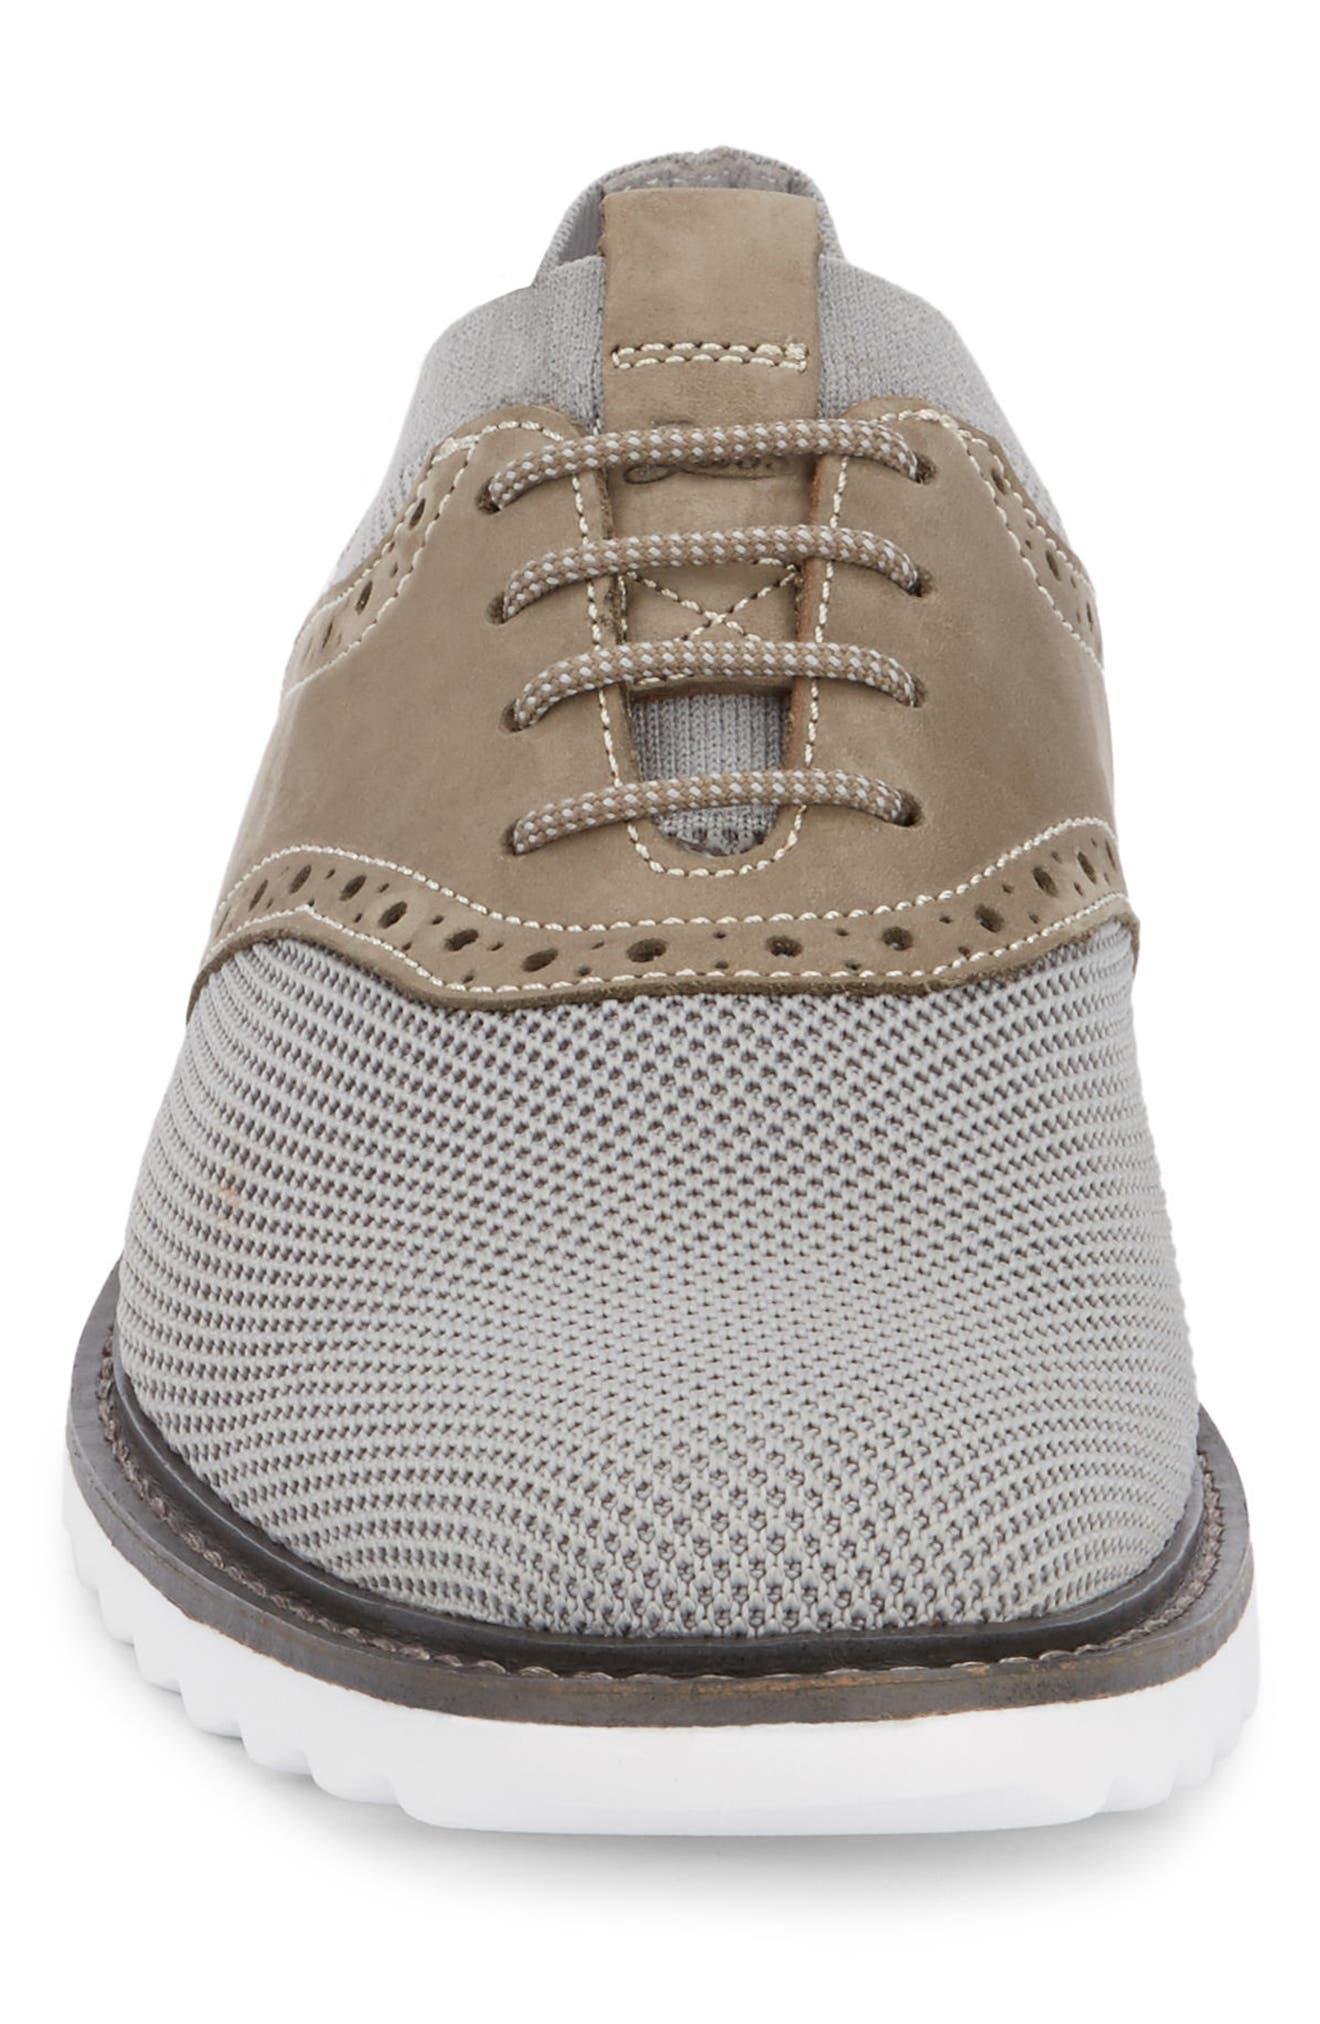 Buck 2.0 Saddle Shoe,                             Alternate thumbnail 4, color,                             Light Grey Knit/ Nubuck